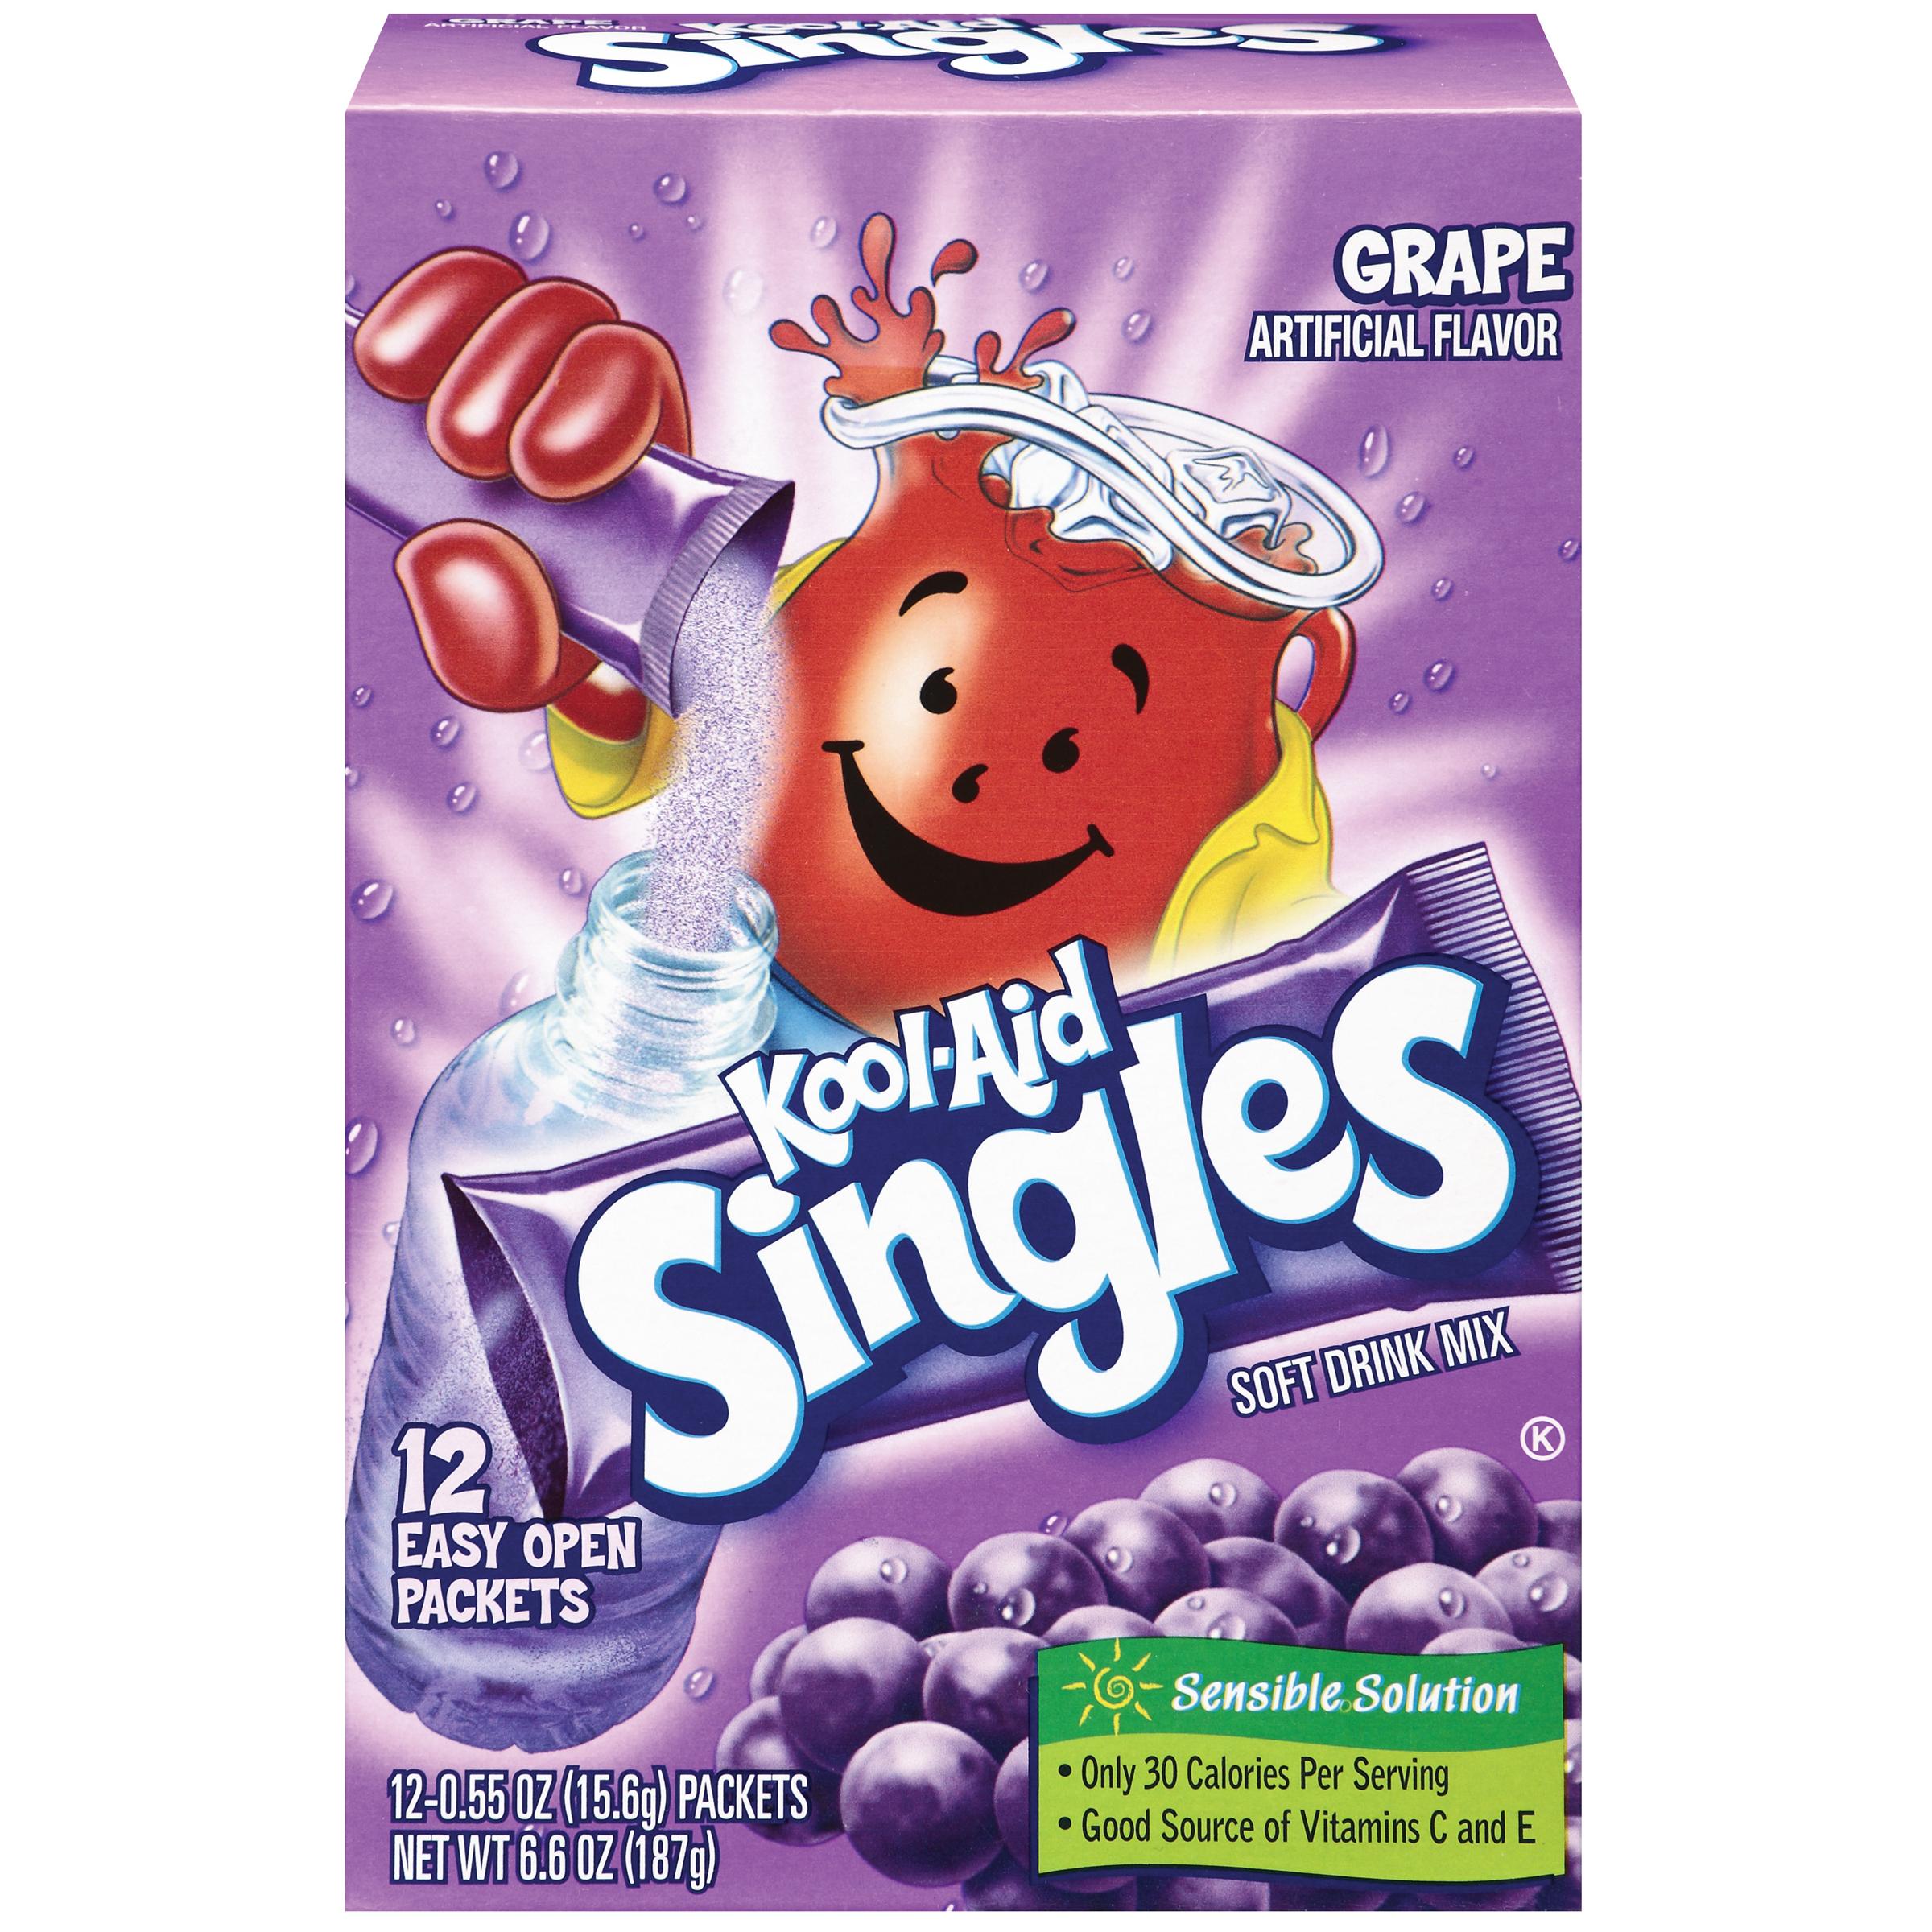 Kool-Aid Singles Grape 12 Ct Soft Drink Mix 6.6 Oz Box image